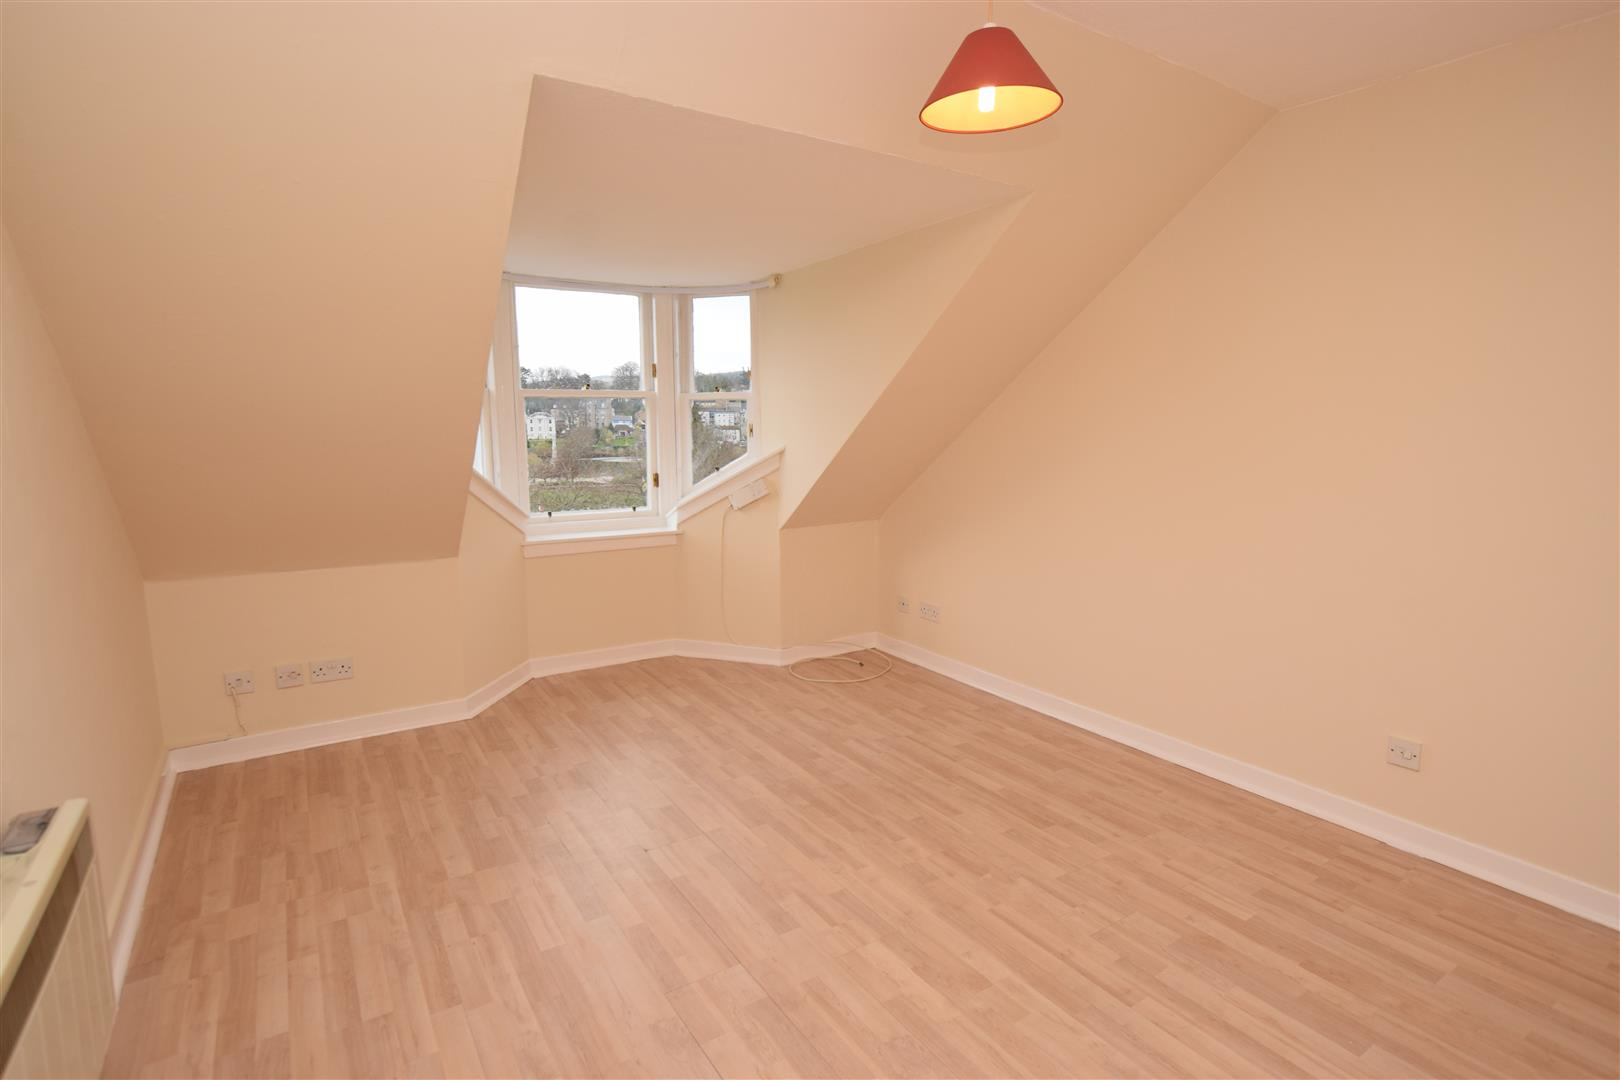 Flat 7, 2, Blackfriars Street, Perth, Perthshire, PH1 5NA, UK